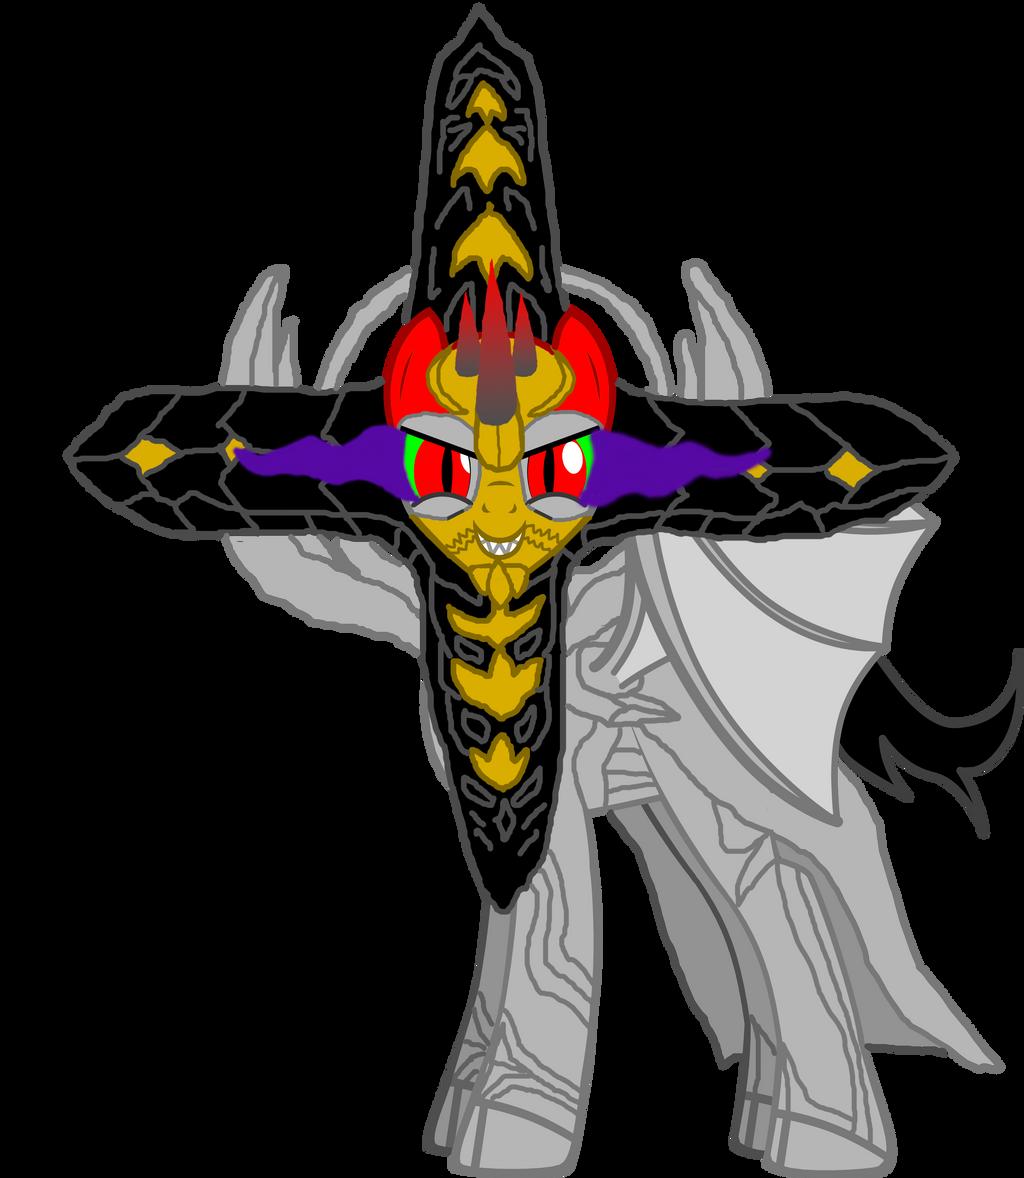 Black Cross King by Crisostomo-Ibarra